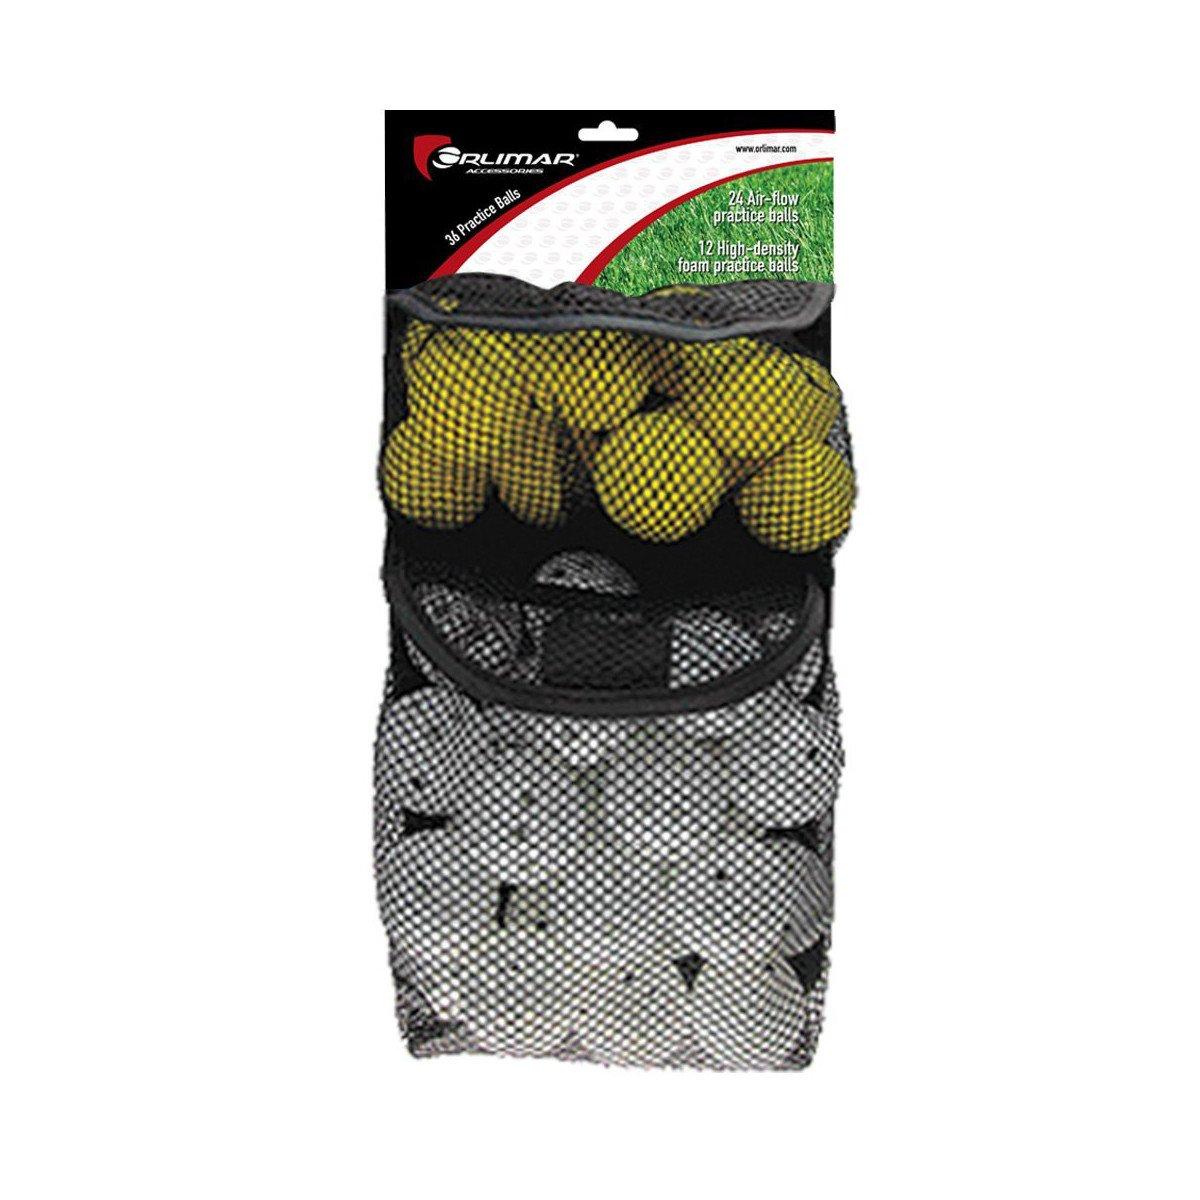 Orlimar Golf 36 Practice Balls (24 with Holes, 12 Foam)